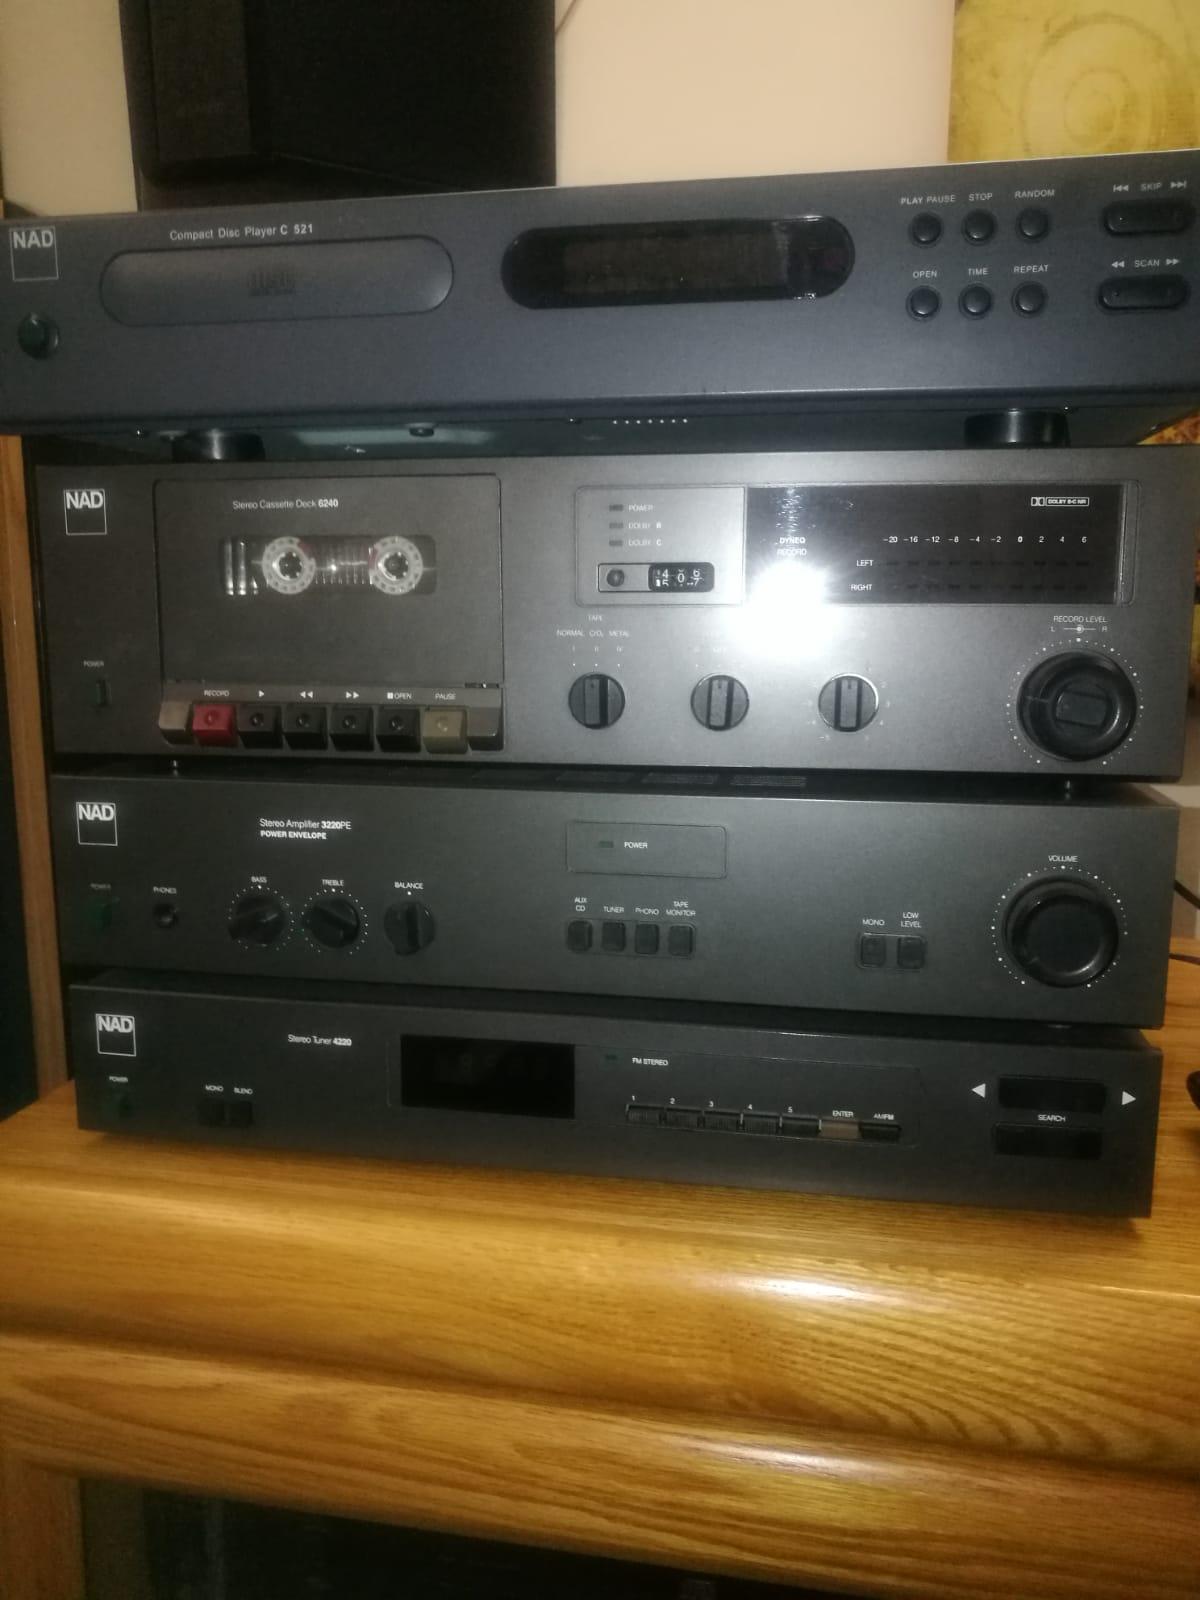 Nad vintage hifis x2 ( Nad 3140 and 3220)